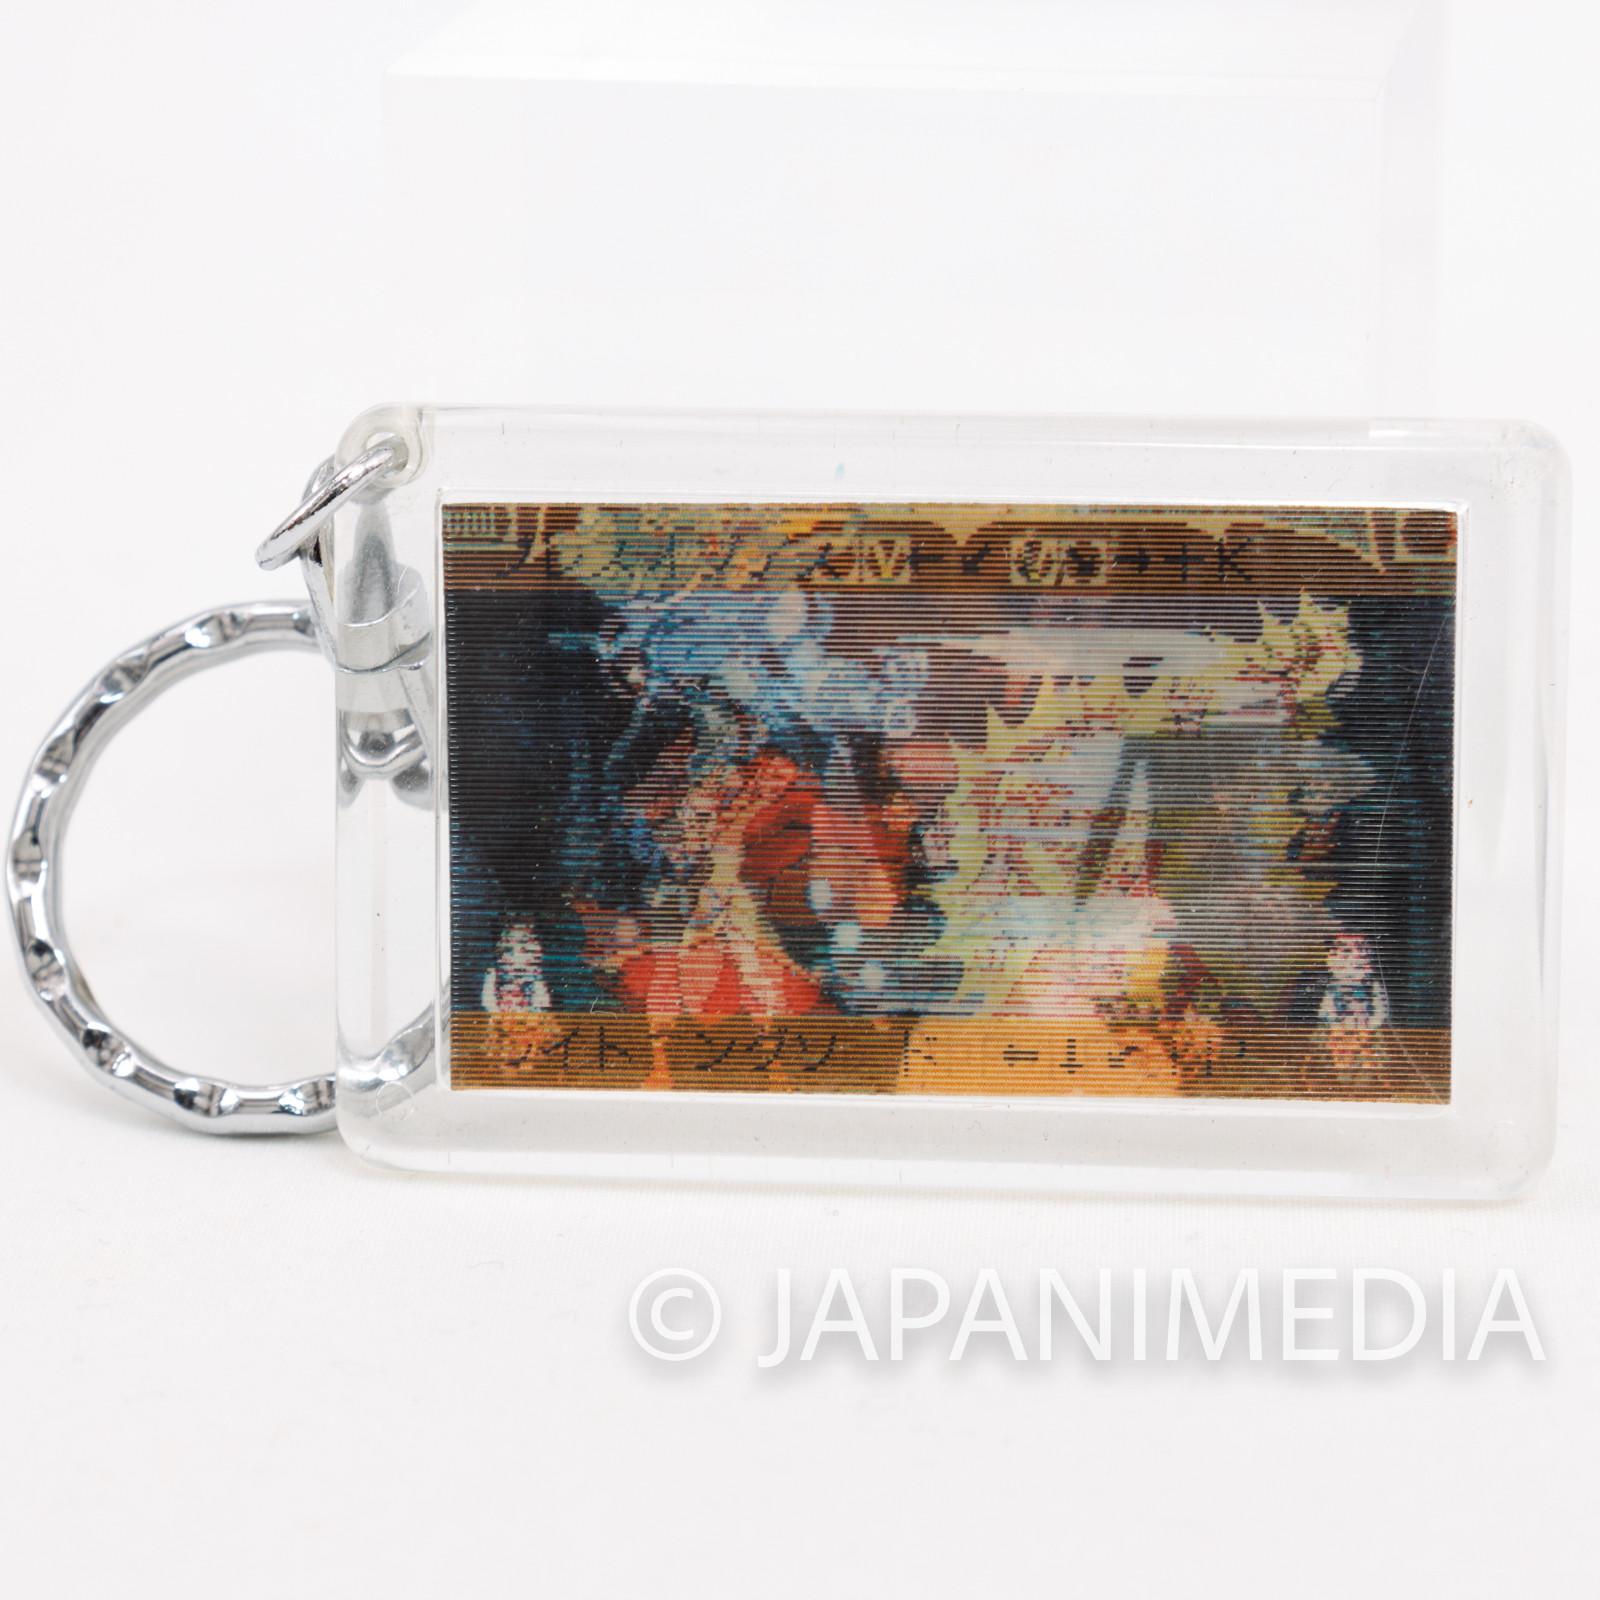 Darkstalkers (Vampire) Donovan Baine Hologram Picture Plate Keychain Capcom JAPAN